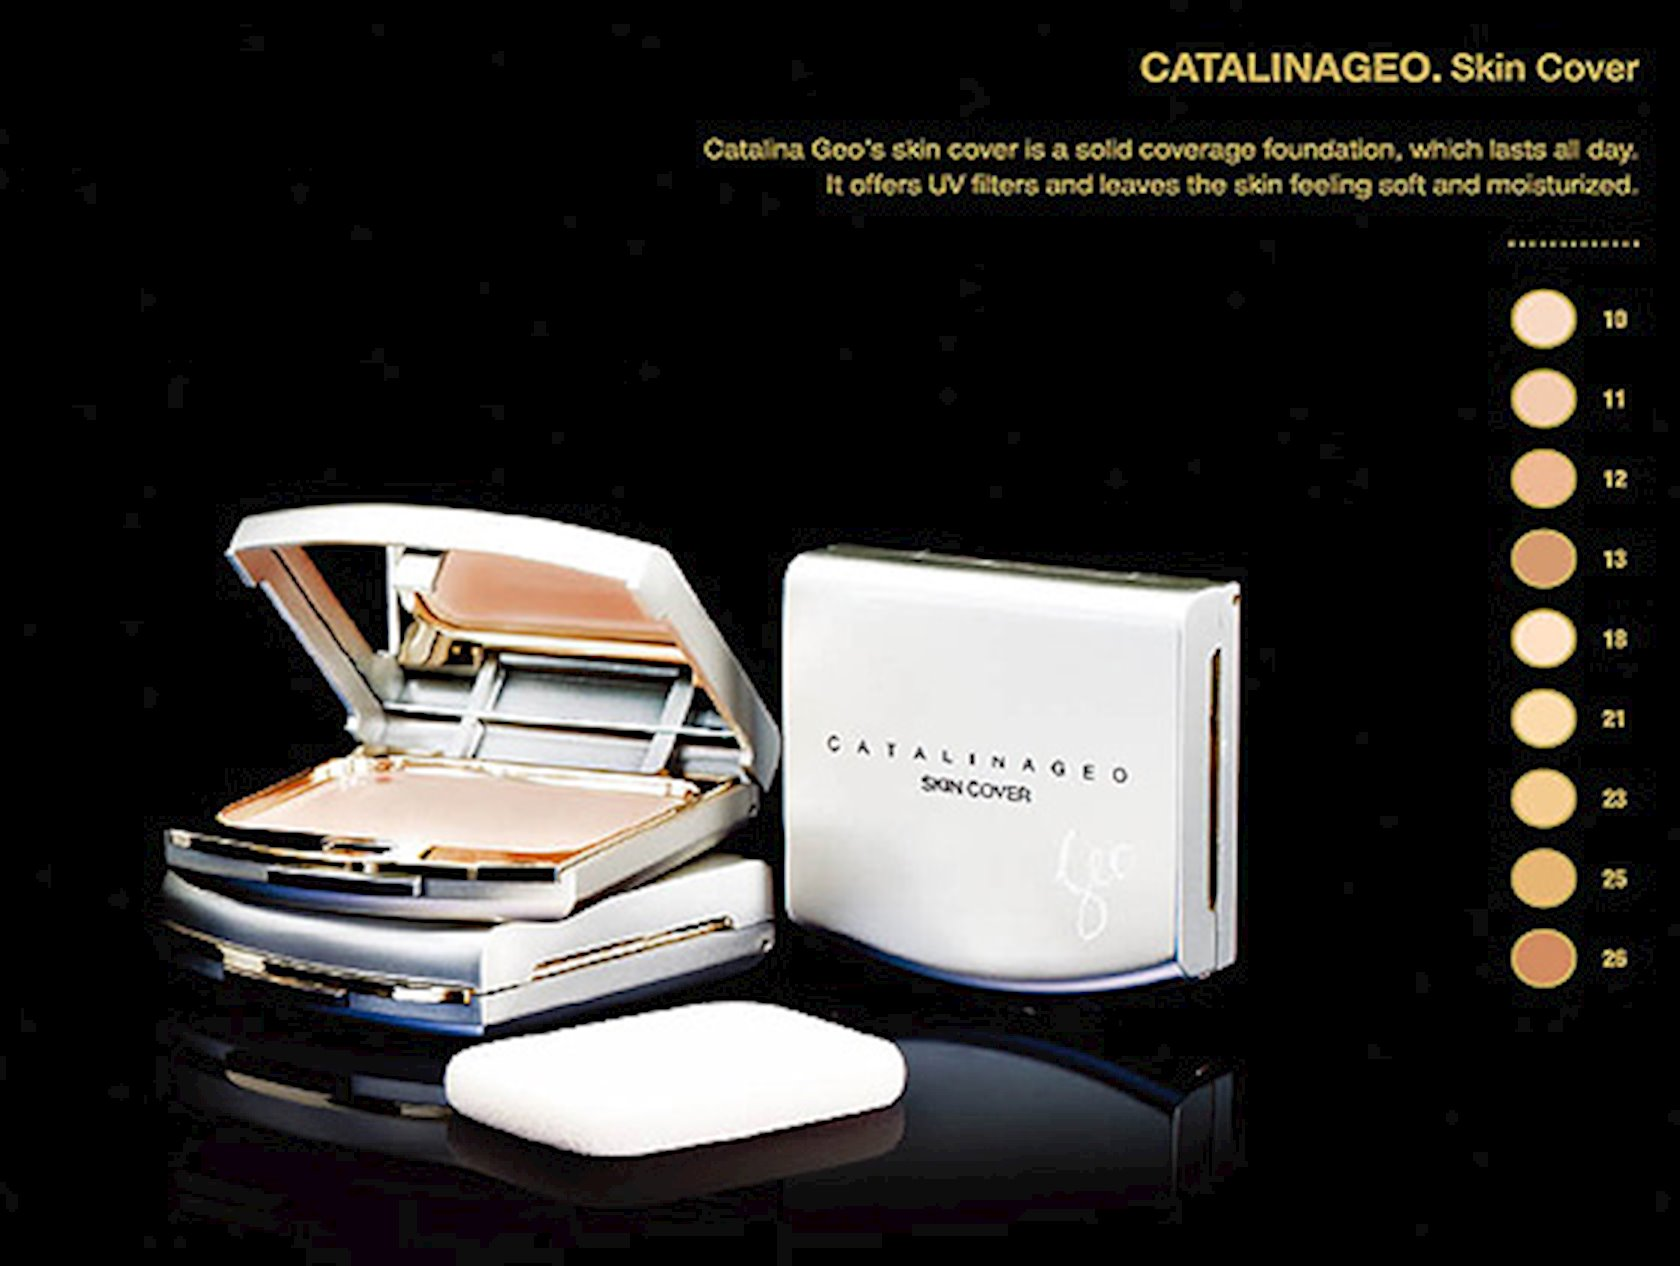 Kompakt krem-kirşan Catalina Geo Skin Cover 10 Rose Pink, 13 q